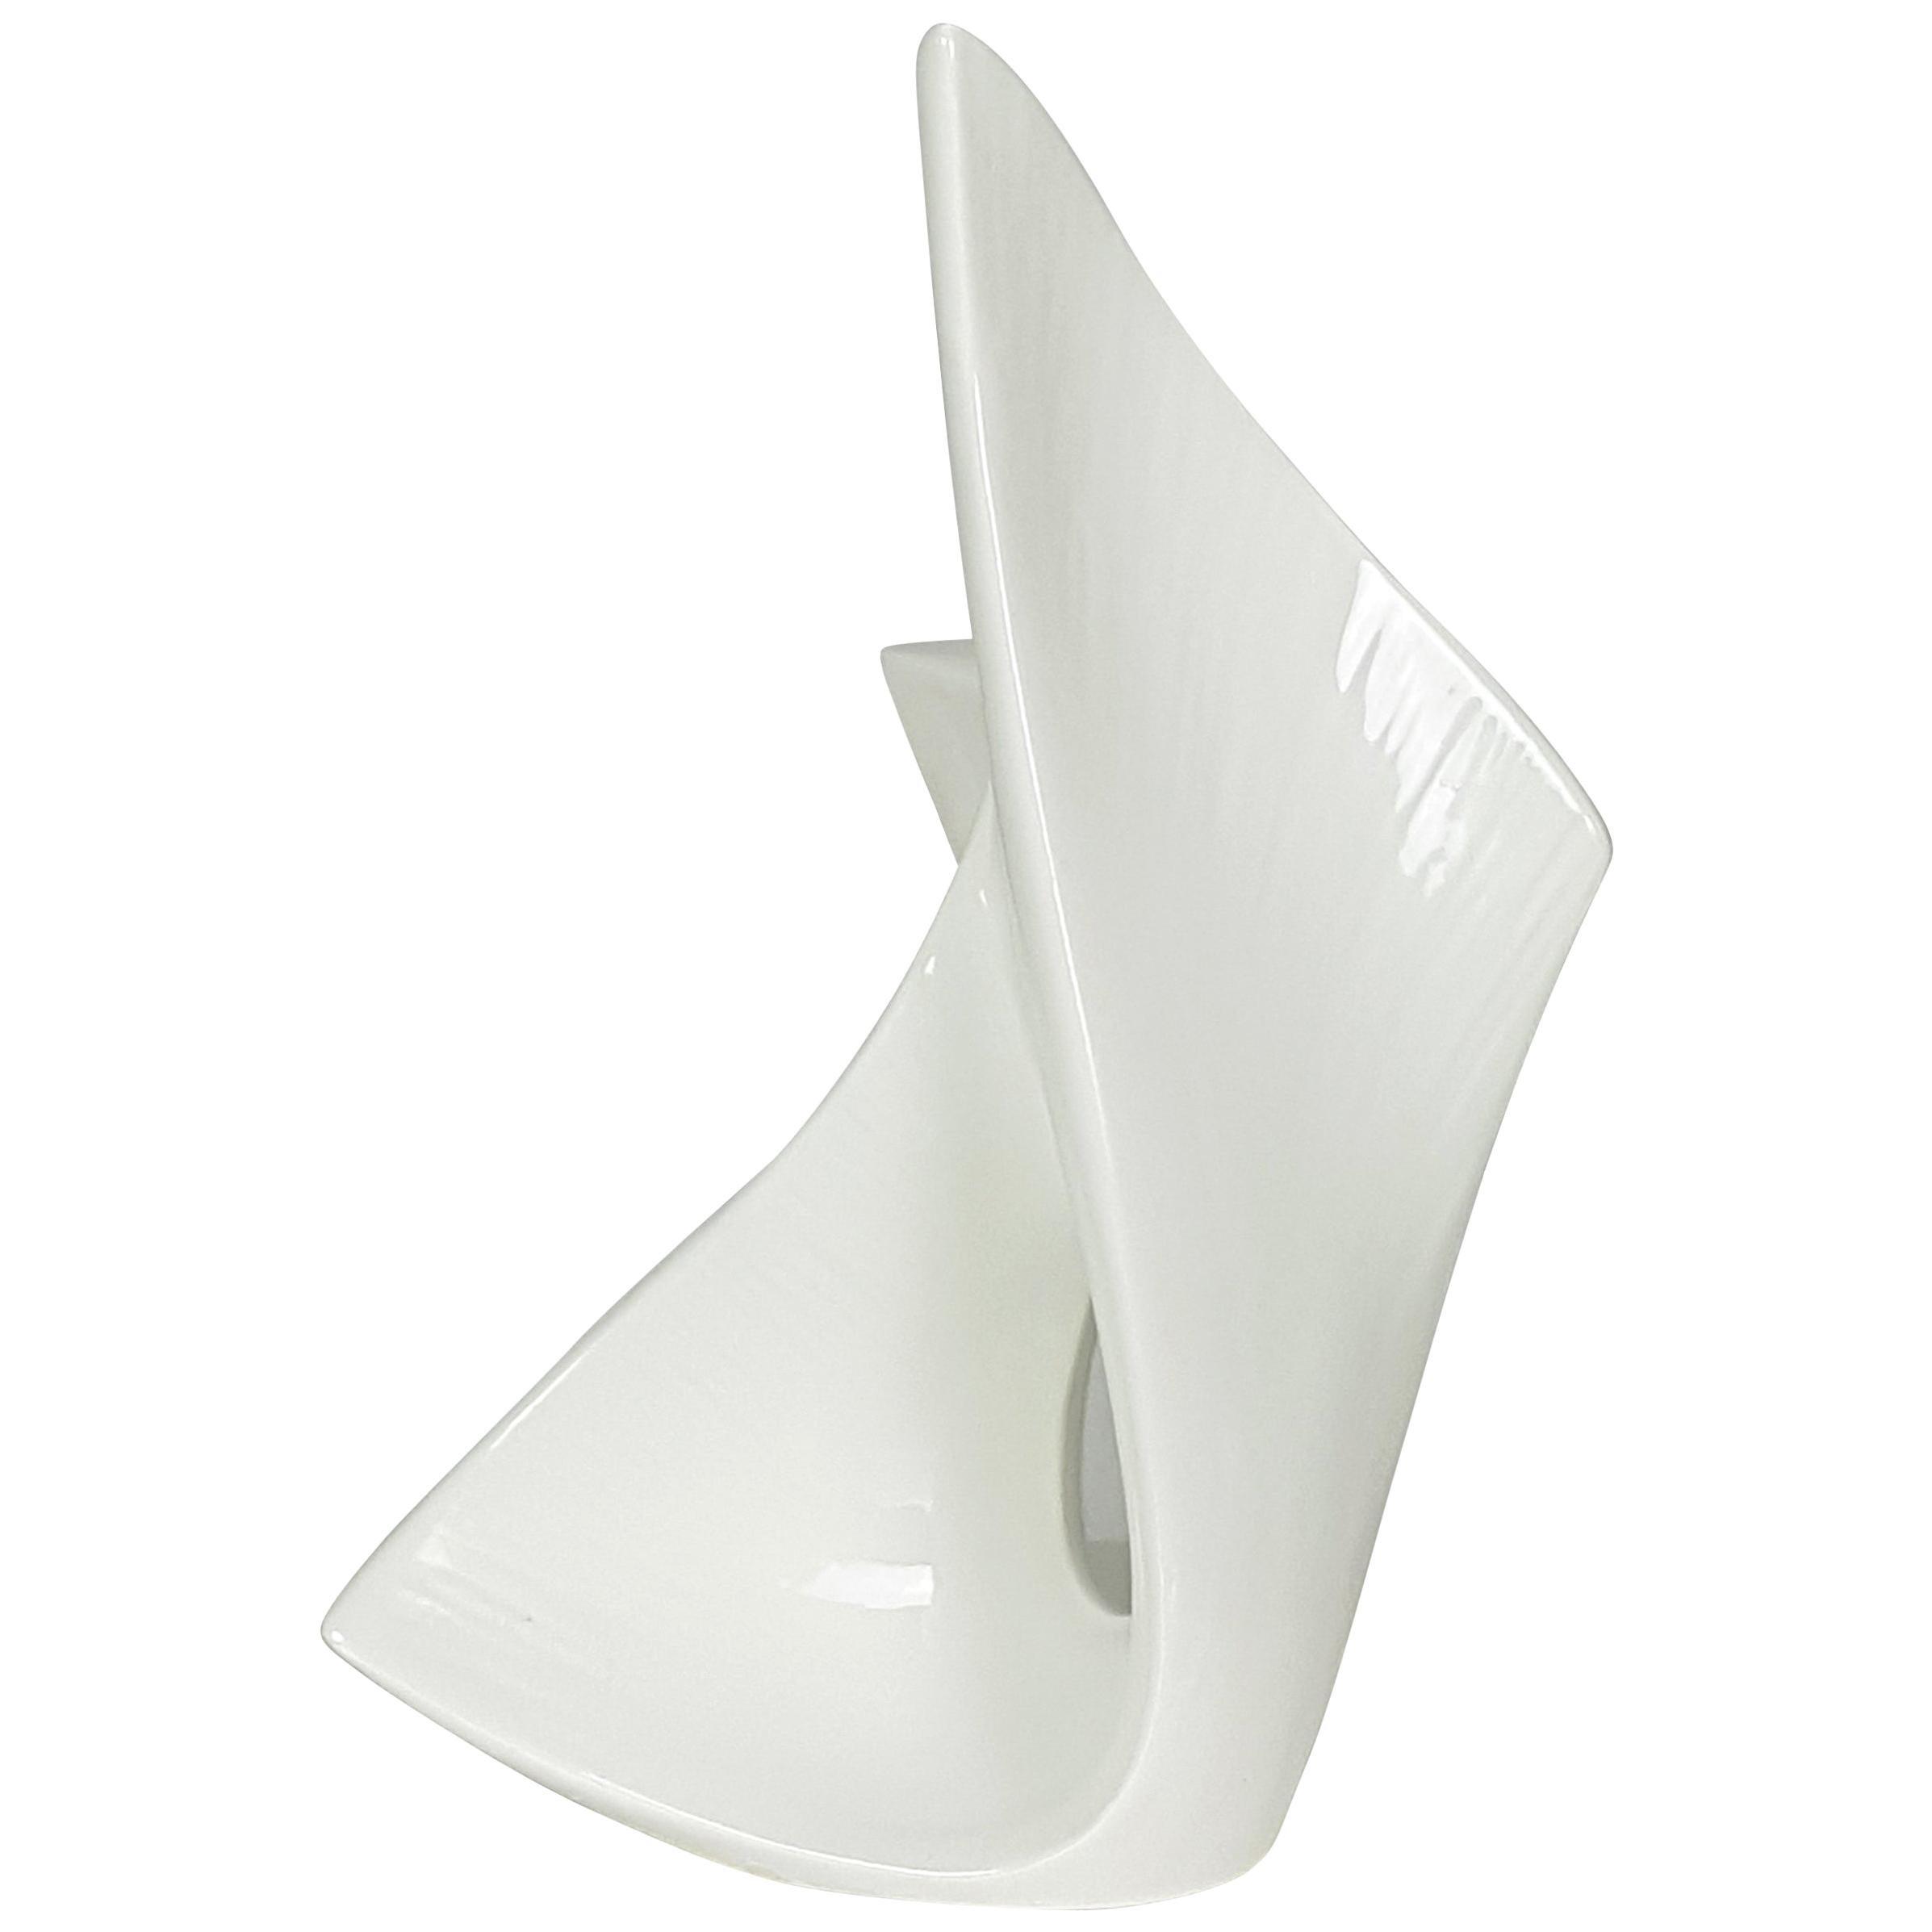 Italian Sculptural White Ceramic Vase from Vibi, 1950s